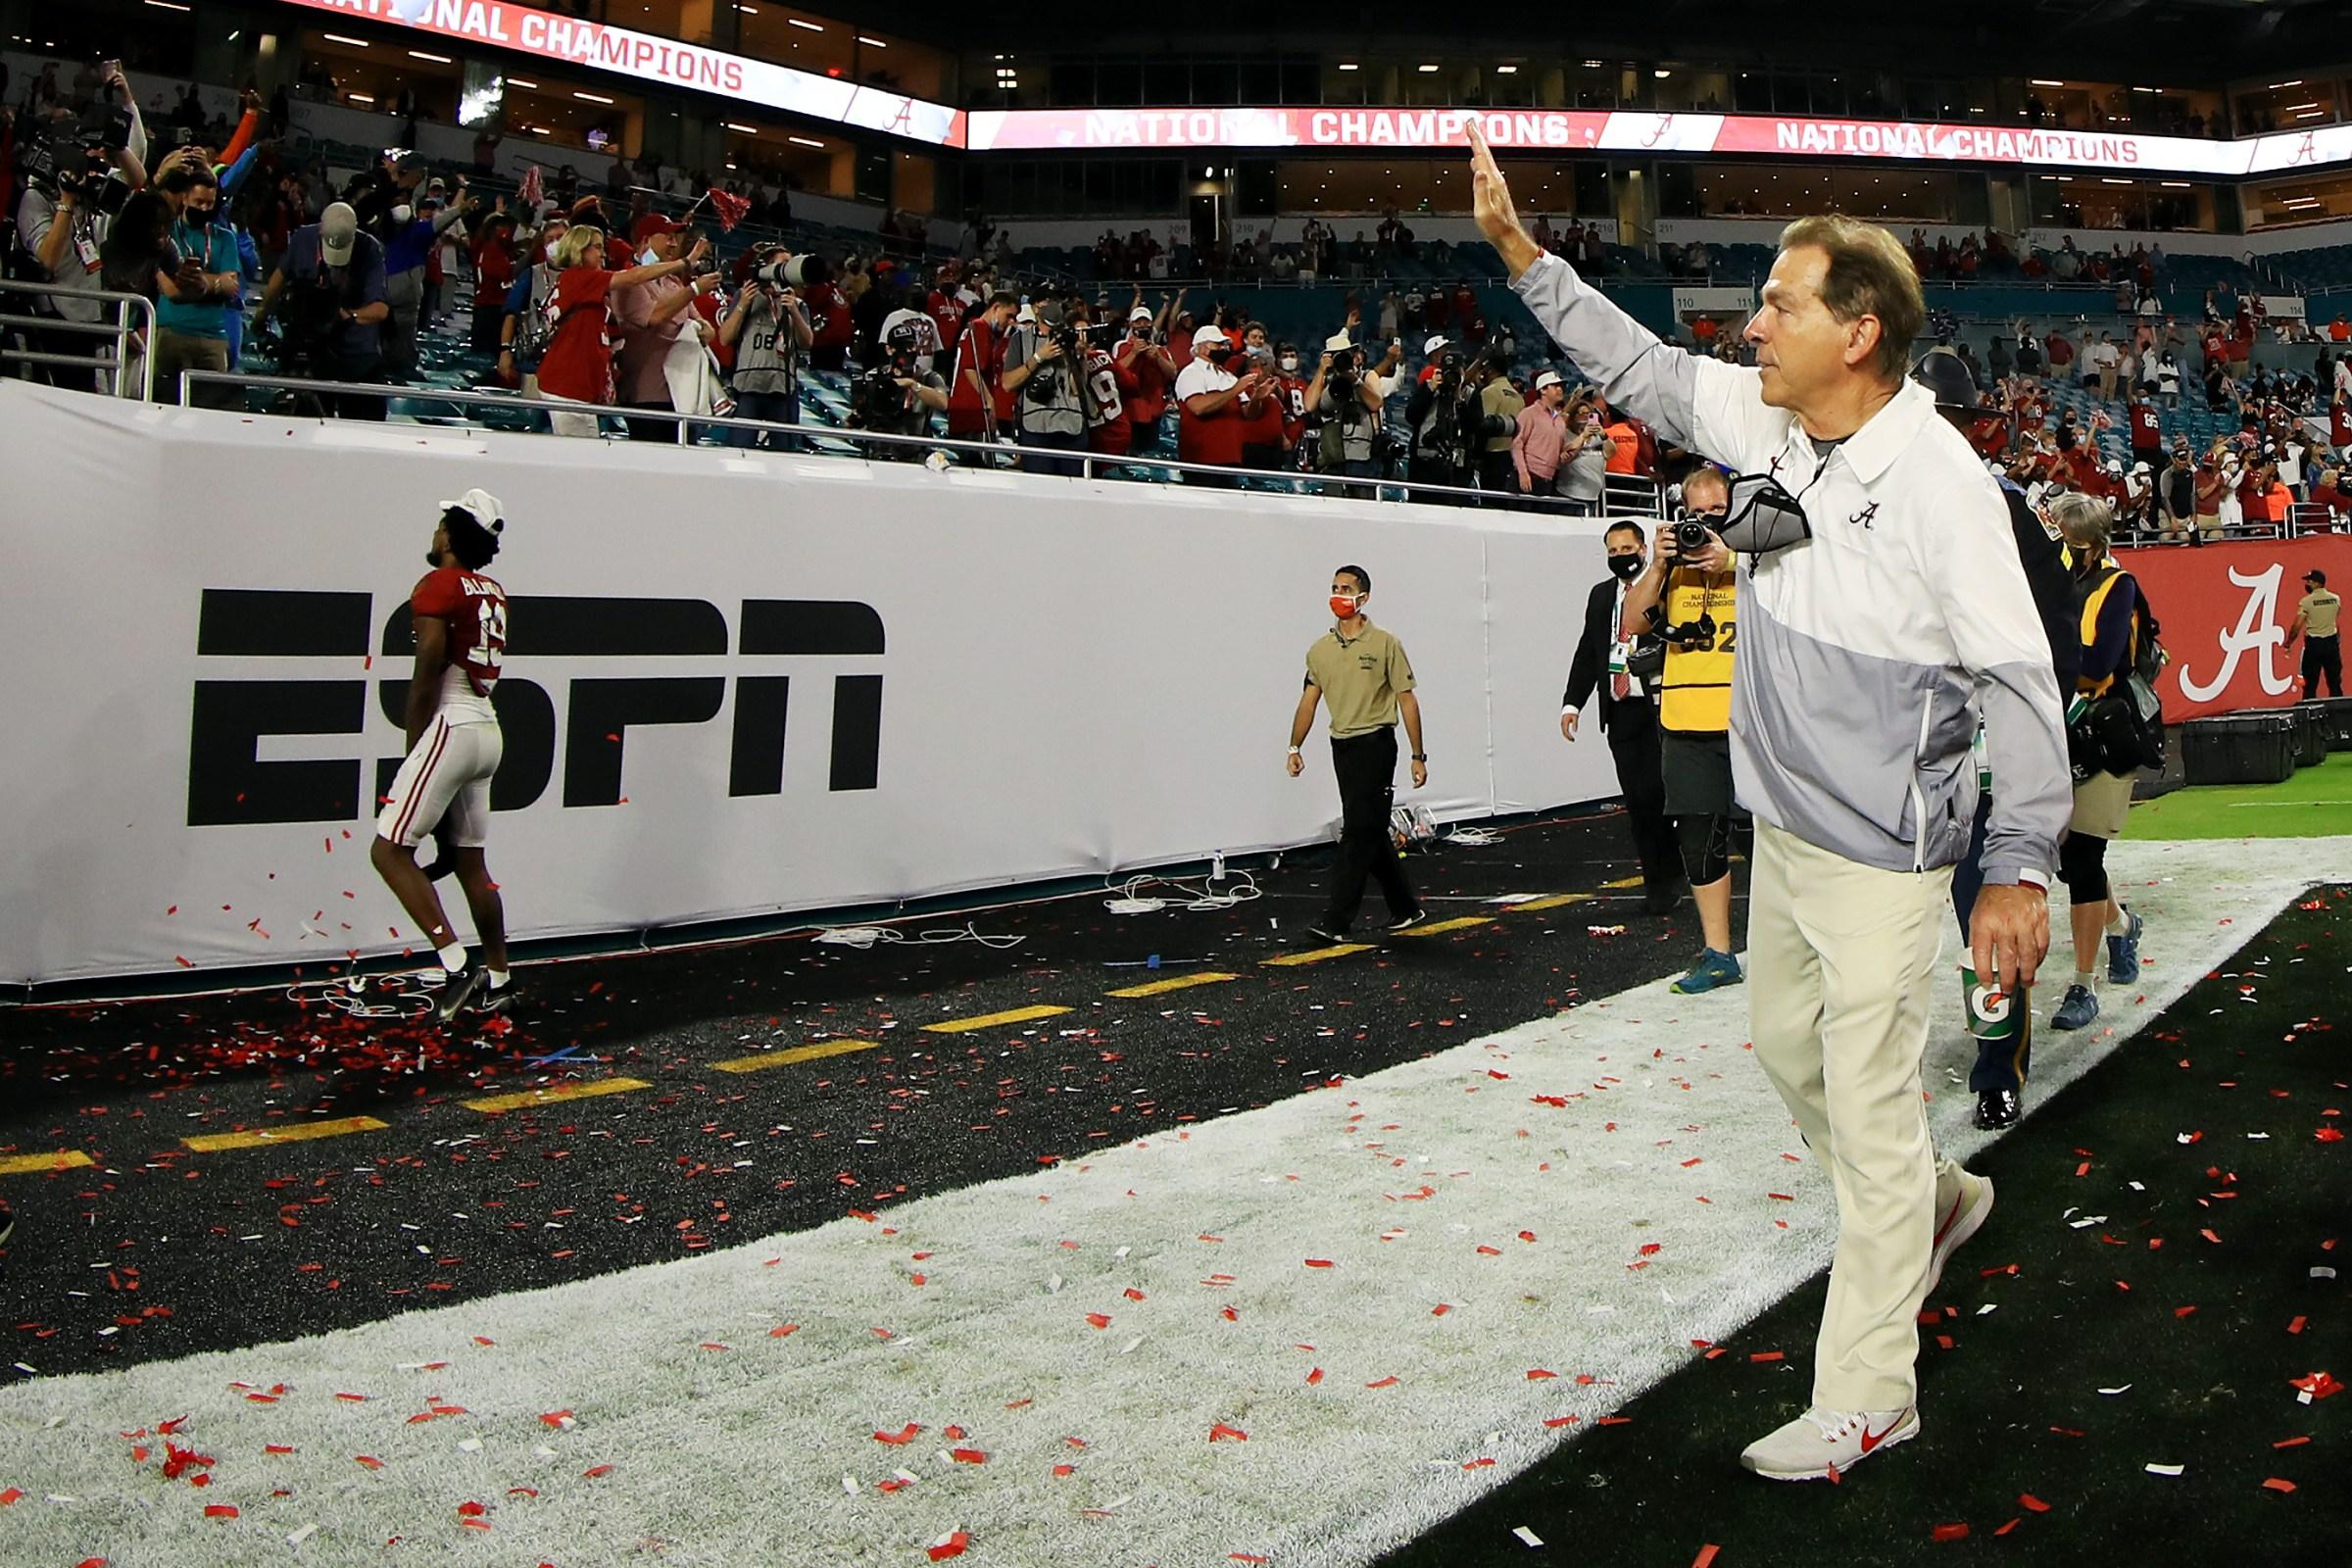 Head coach Nick Saban of the Alabama Crimson Tide gestures to fans